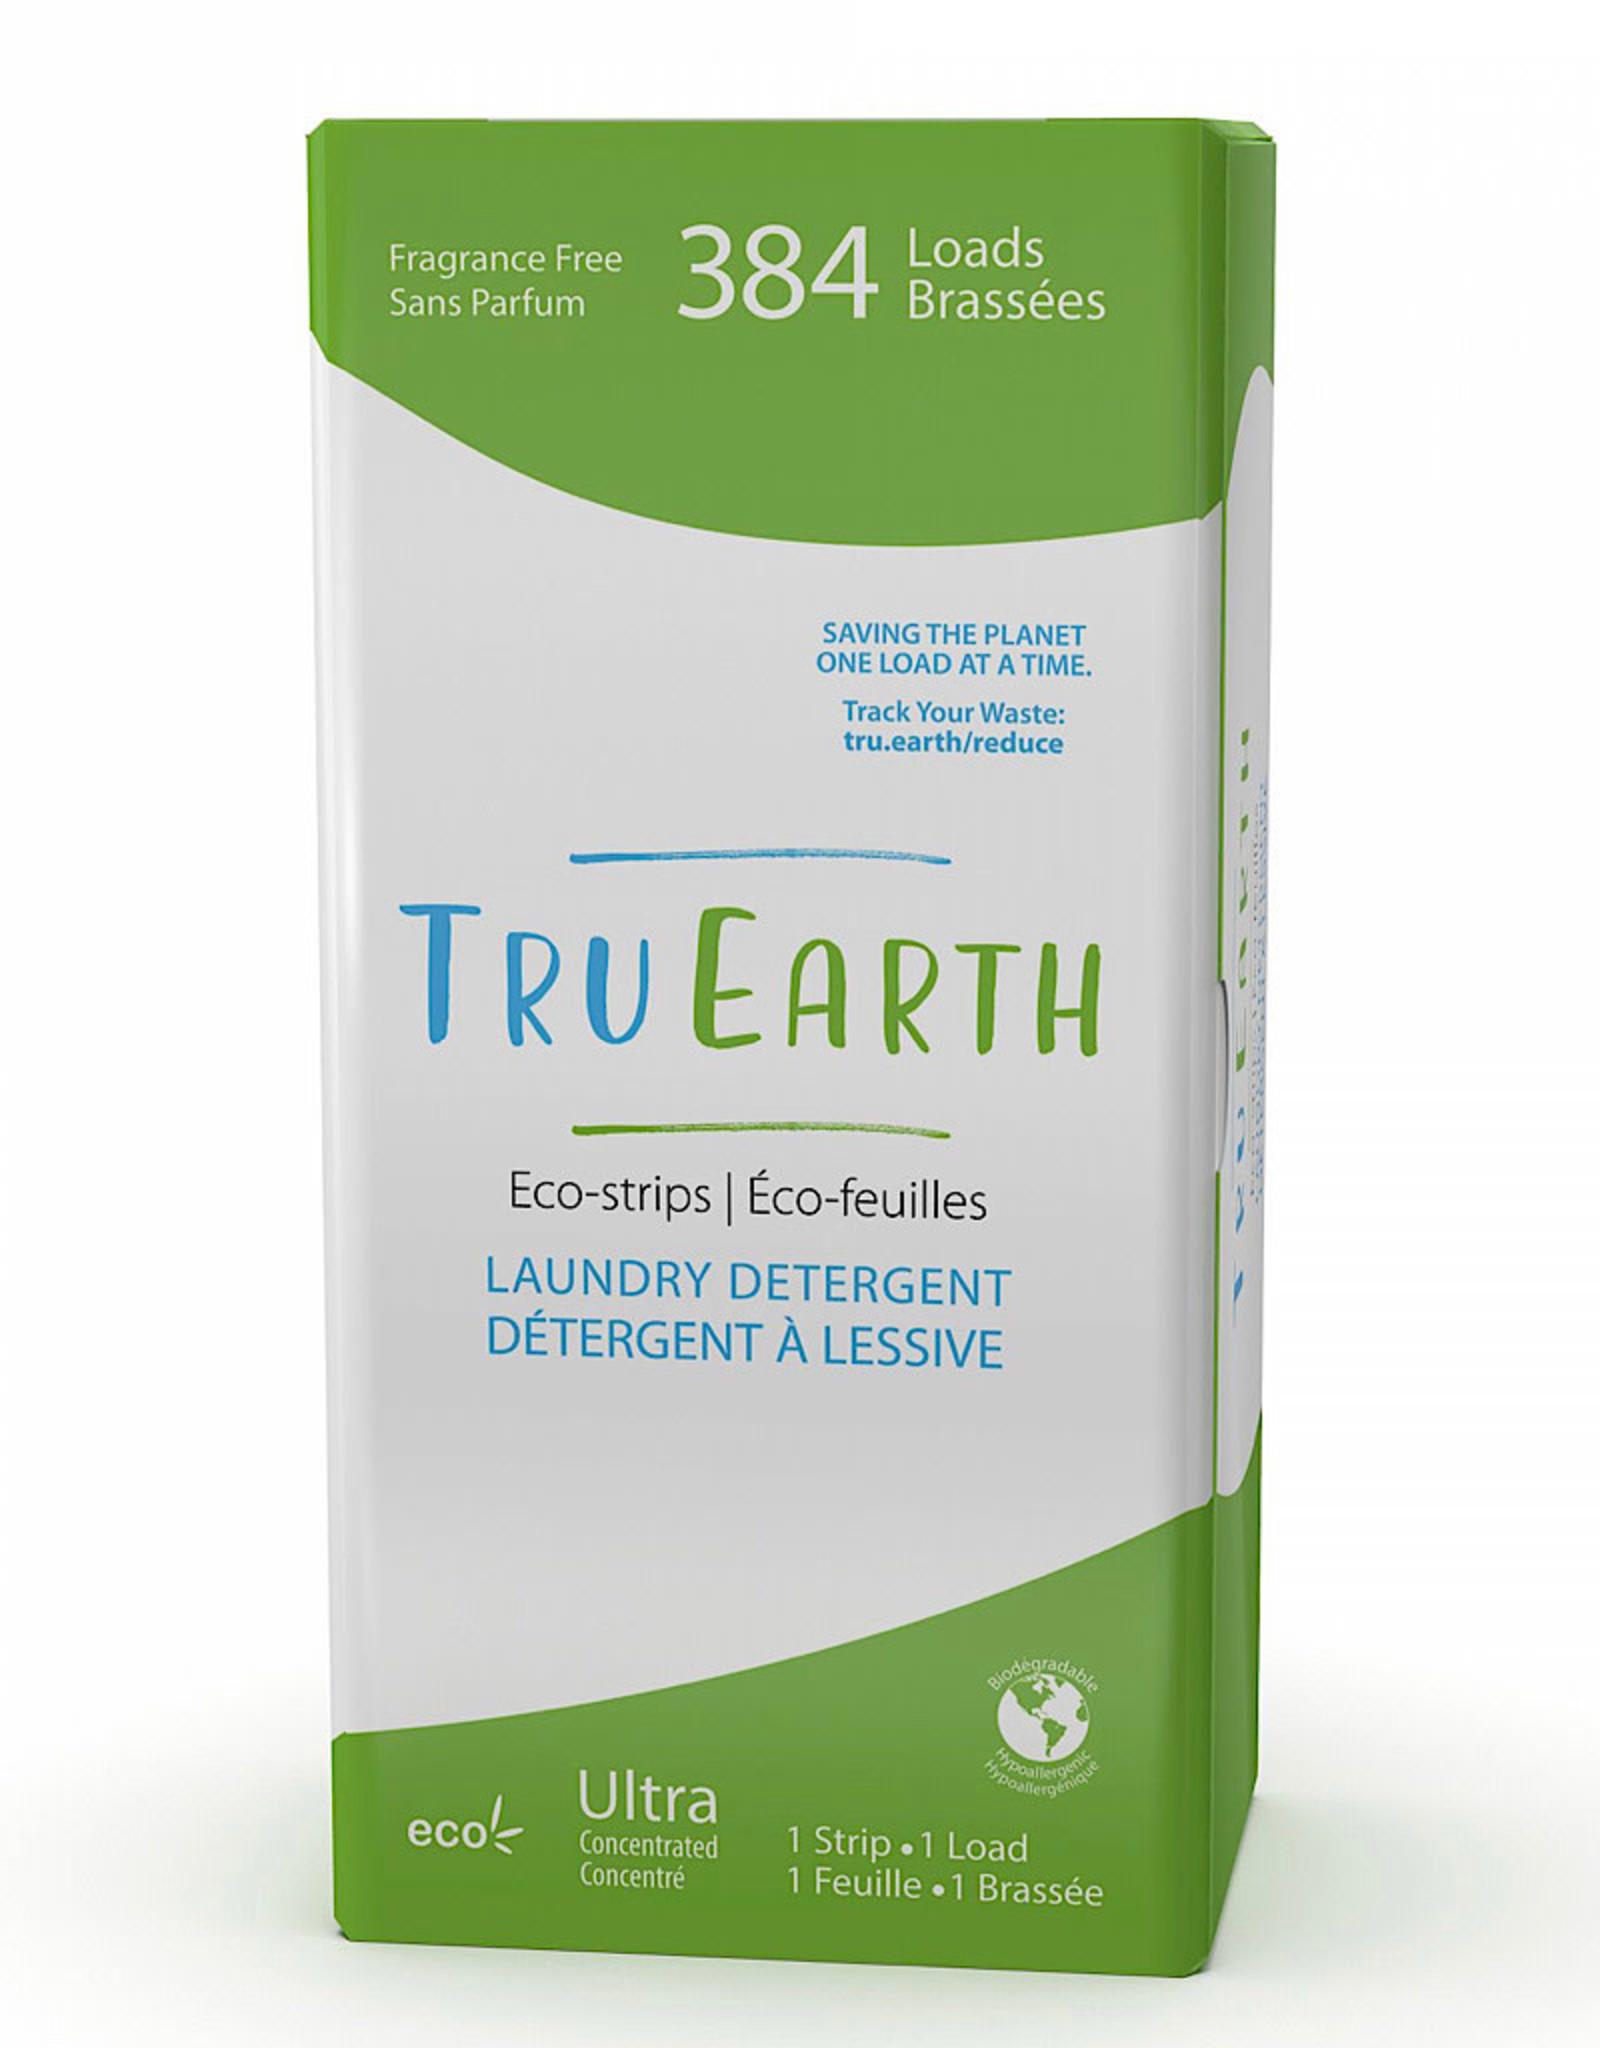 Tru Earth Eco-Strip Laundry Detergent - 384 loads